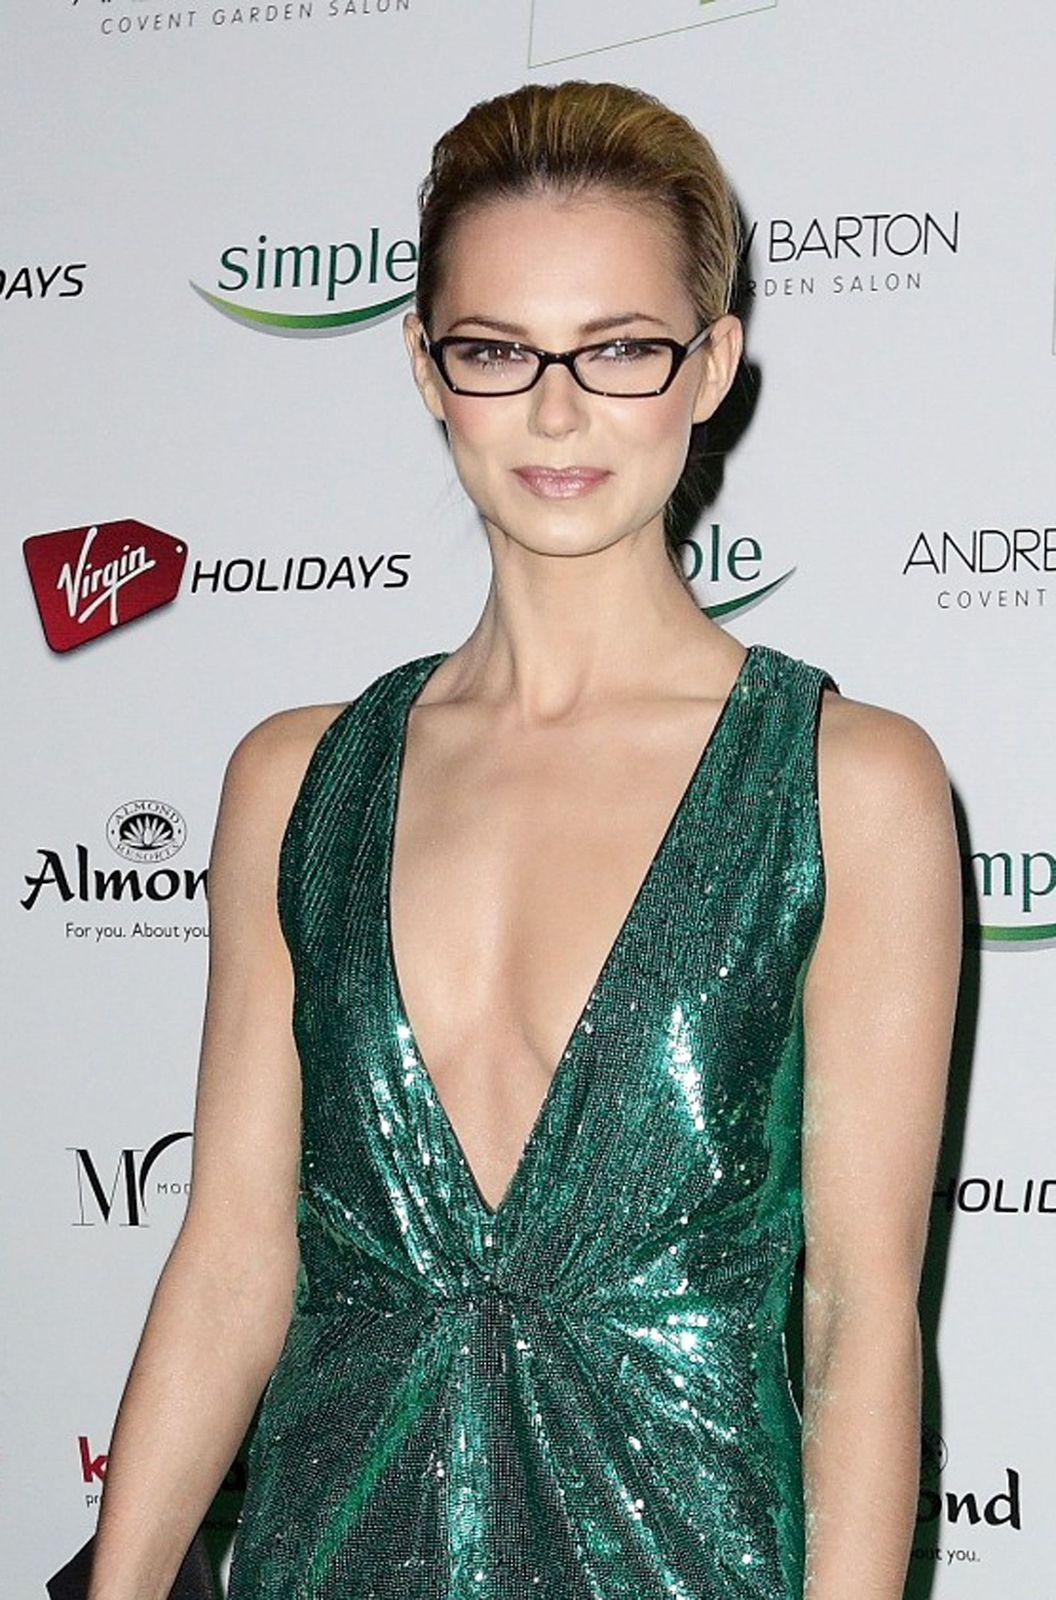 Cara Pifko,Deborah Gray Porno photos Lindsay Lohan,Dina Perbellini